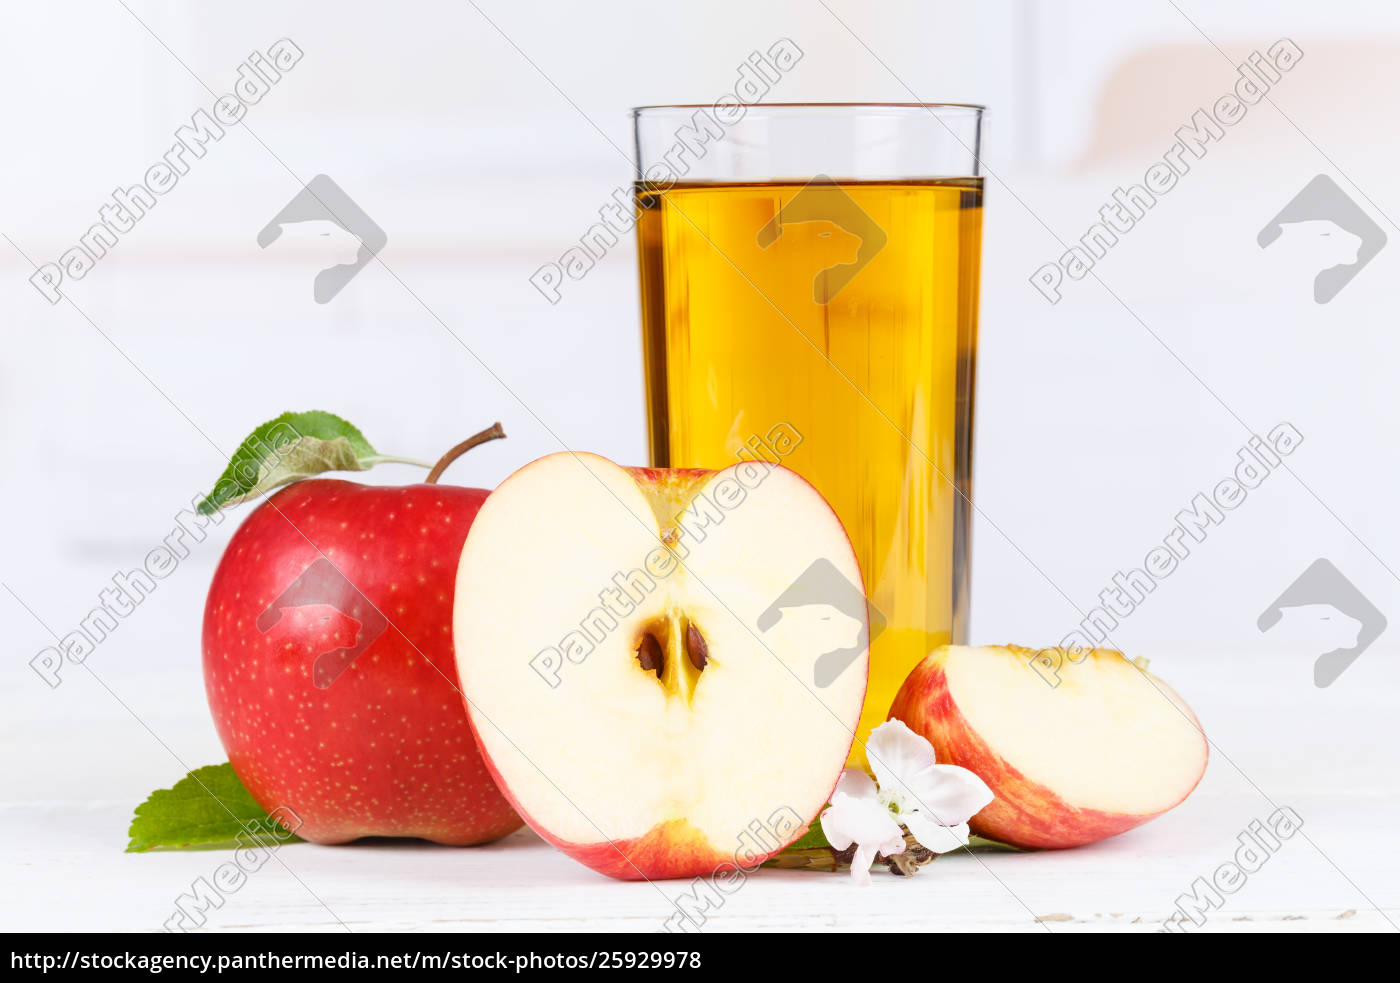 apfelsaft, frust-Äpfel, trinken, glas - 25929978